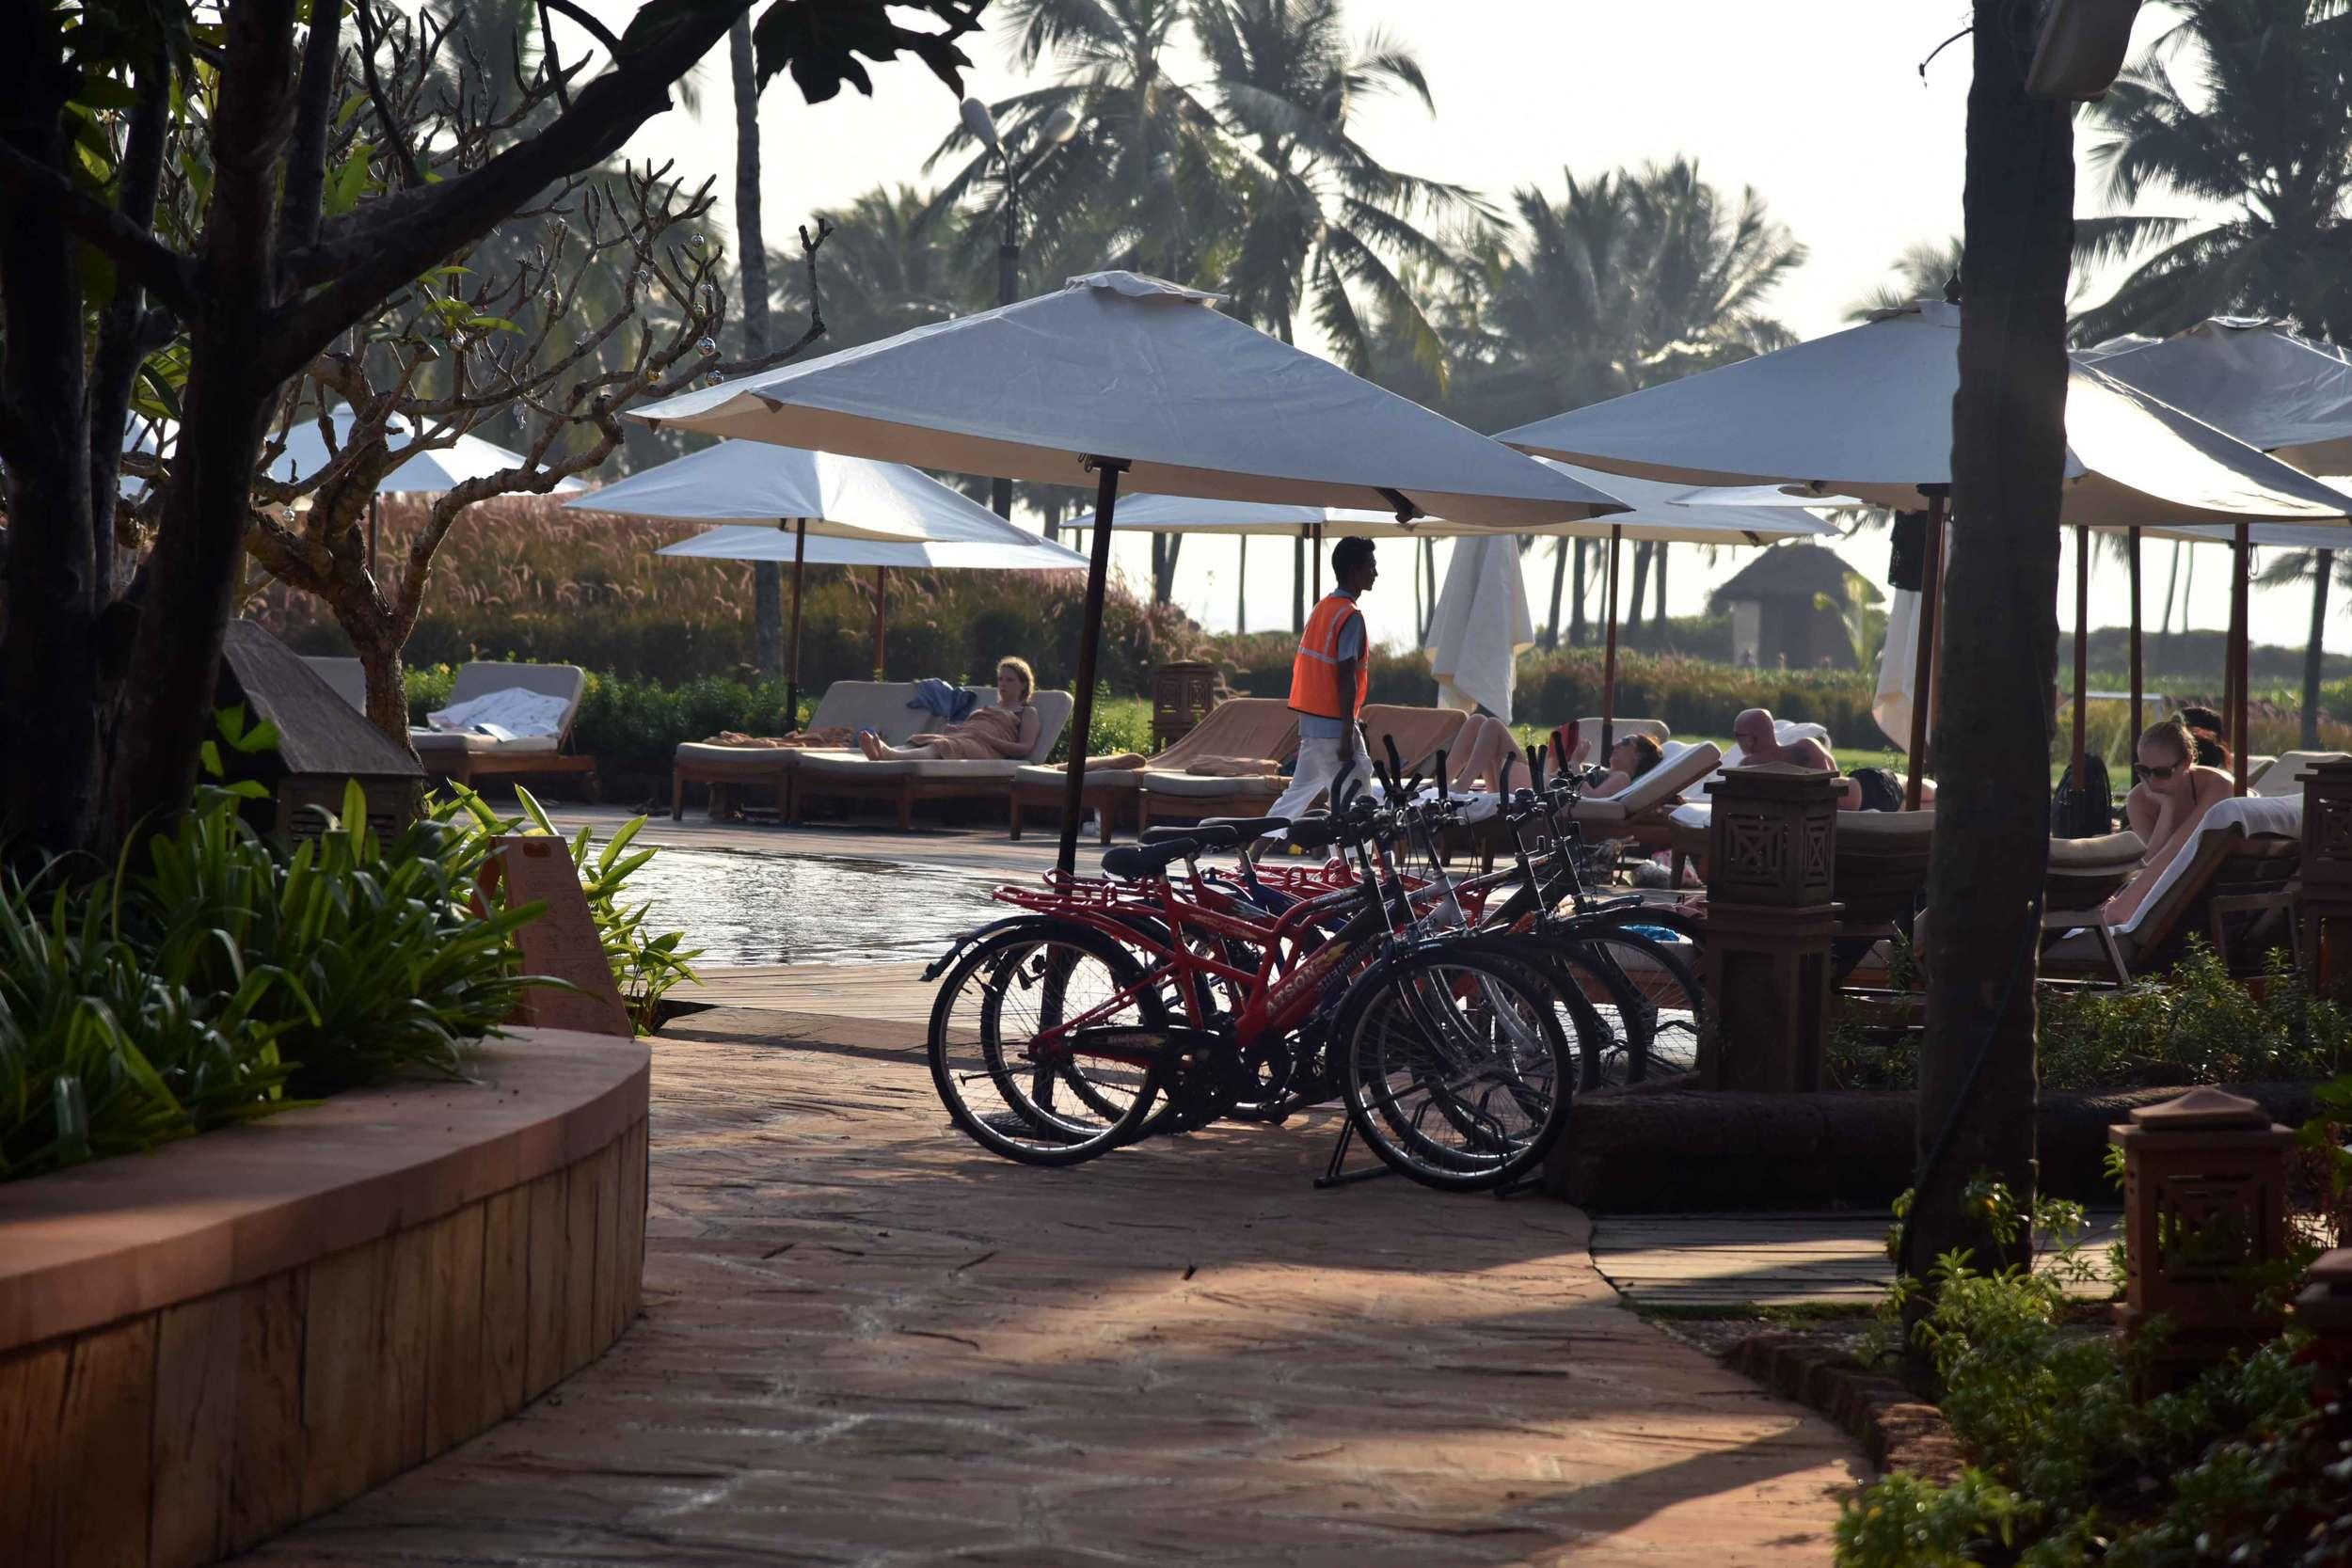 Bike rentals,Outdoor pool,Park Hyatt, Goa, India, 5 star hotel, luxury beach resort, spa. Image©thingstodot.com